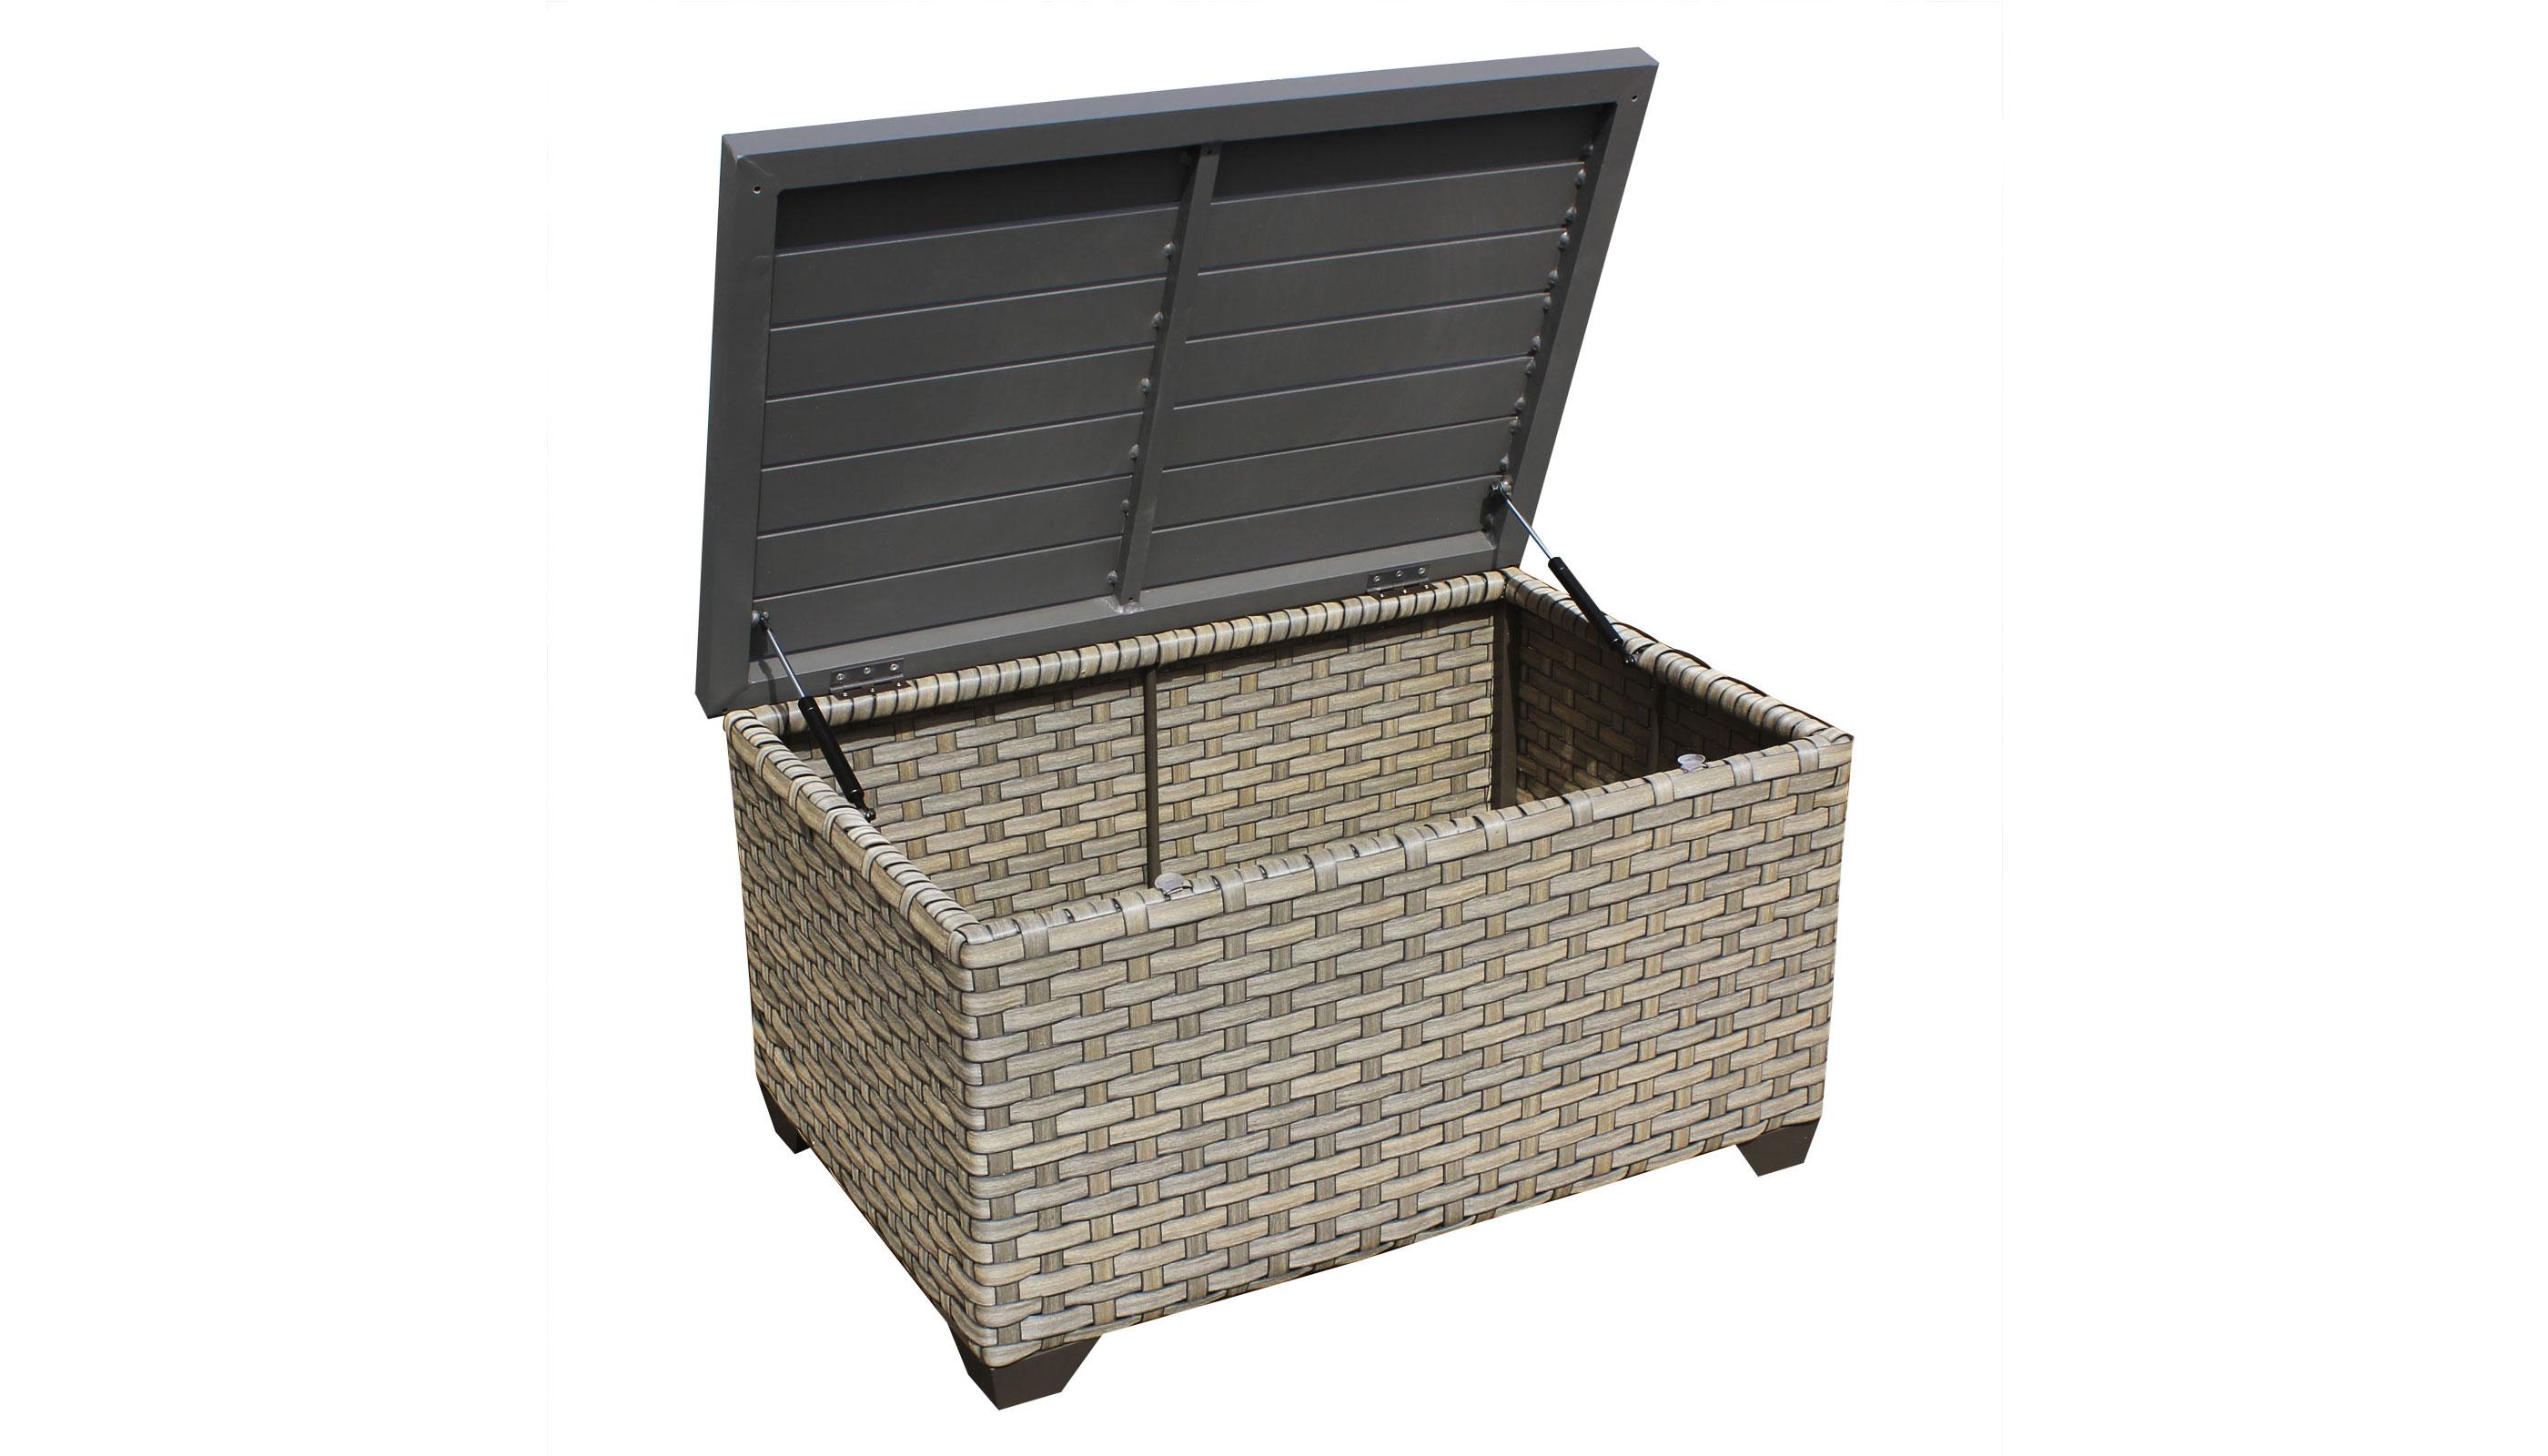 Monterey Storage Coffee Table Tkc015b Scta